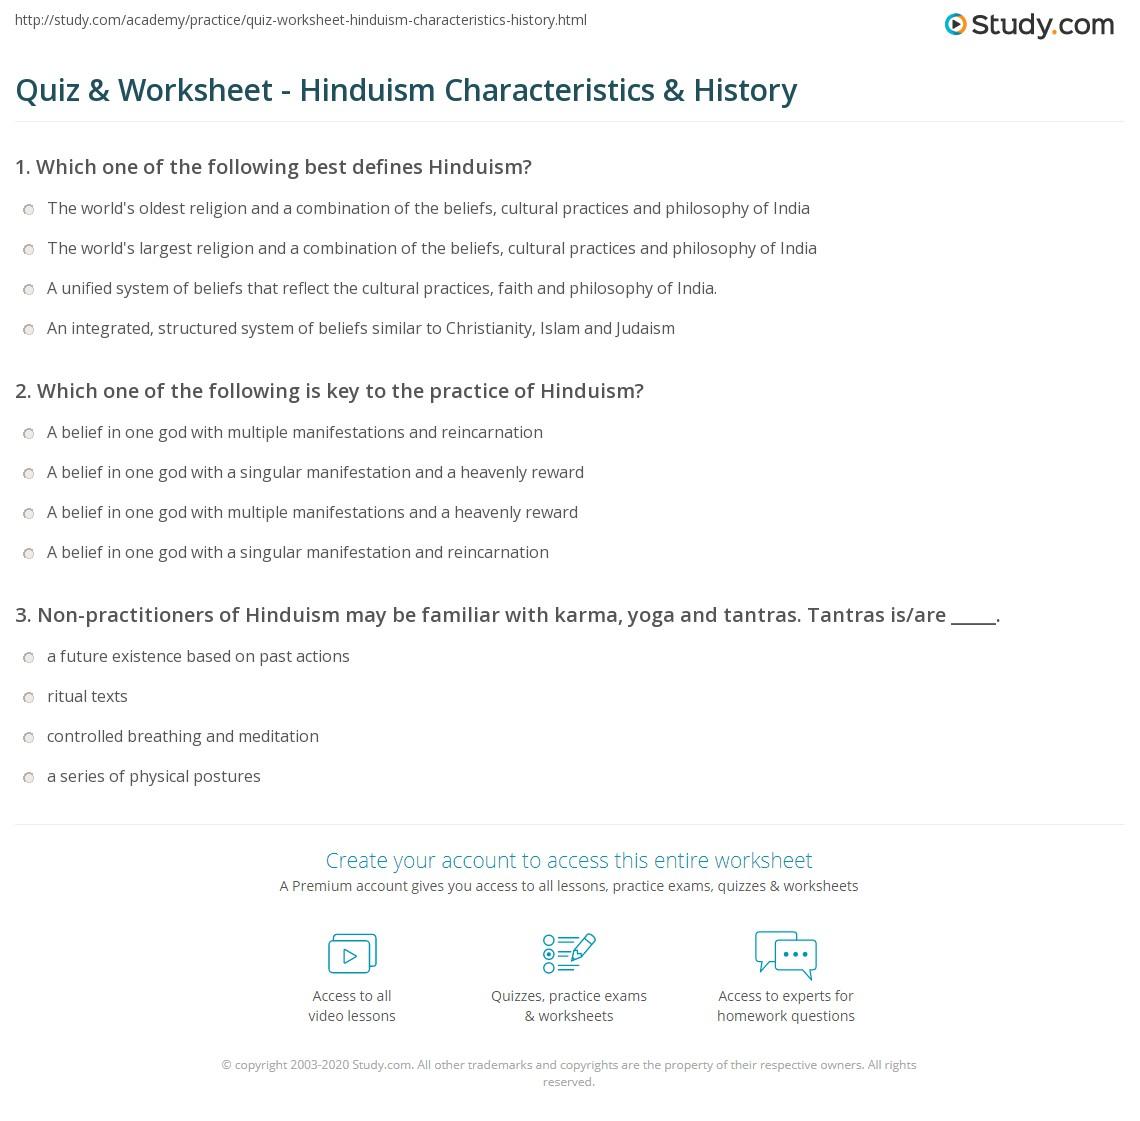 quiz & worksheet - hinduism characteristics & history | study